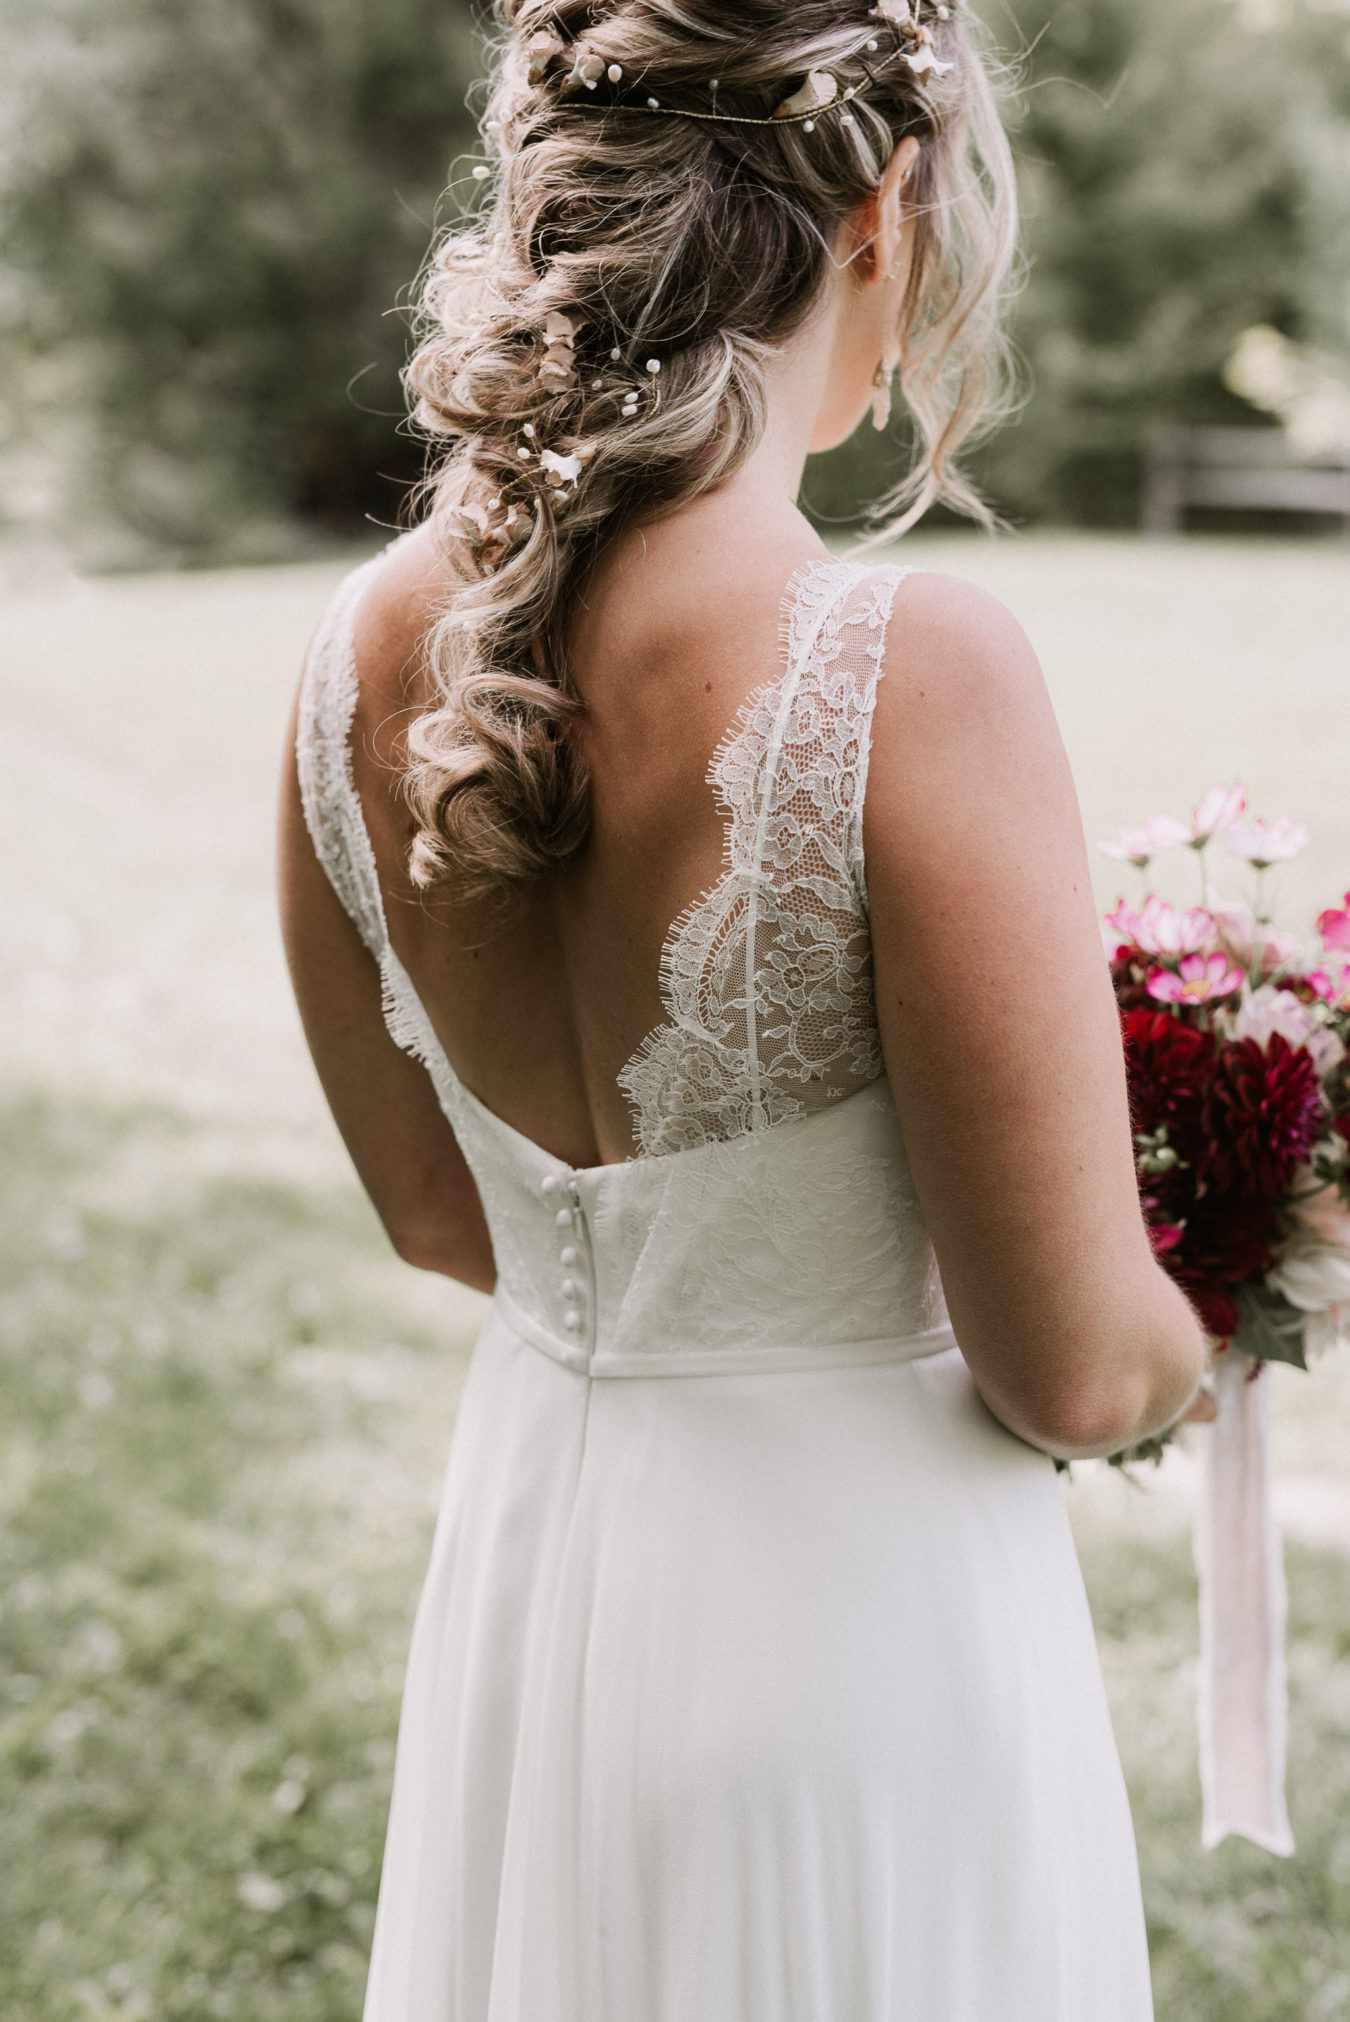 Embellished Undone Braid